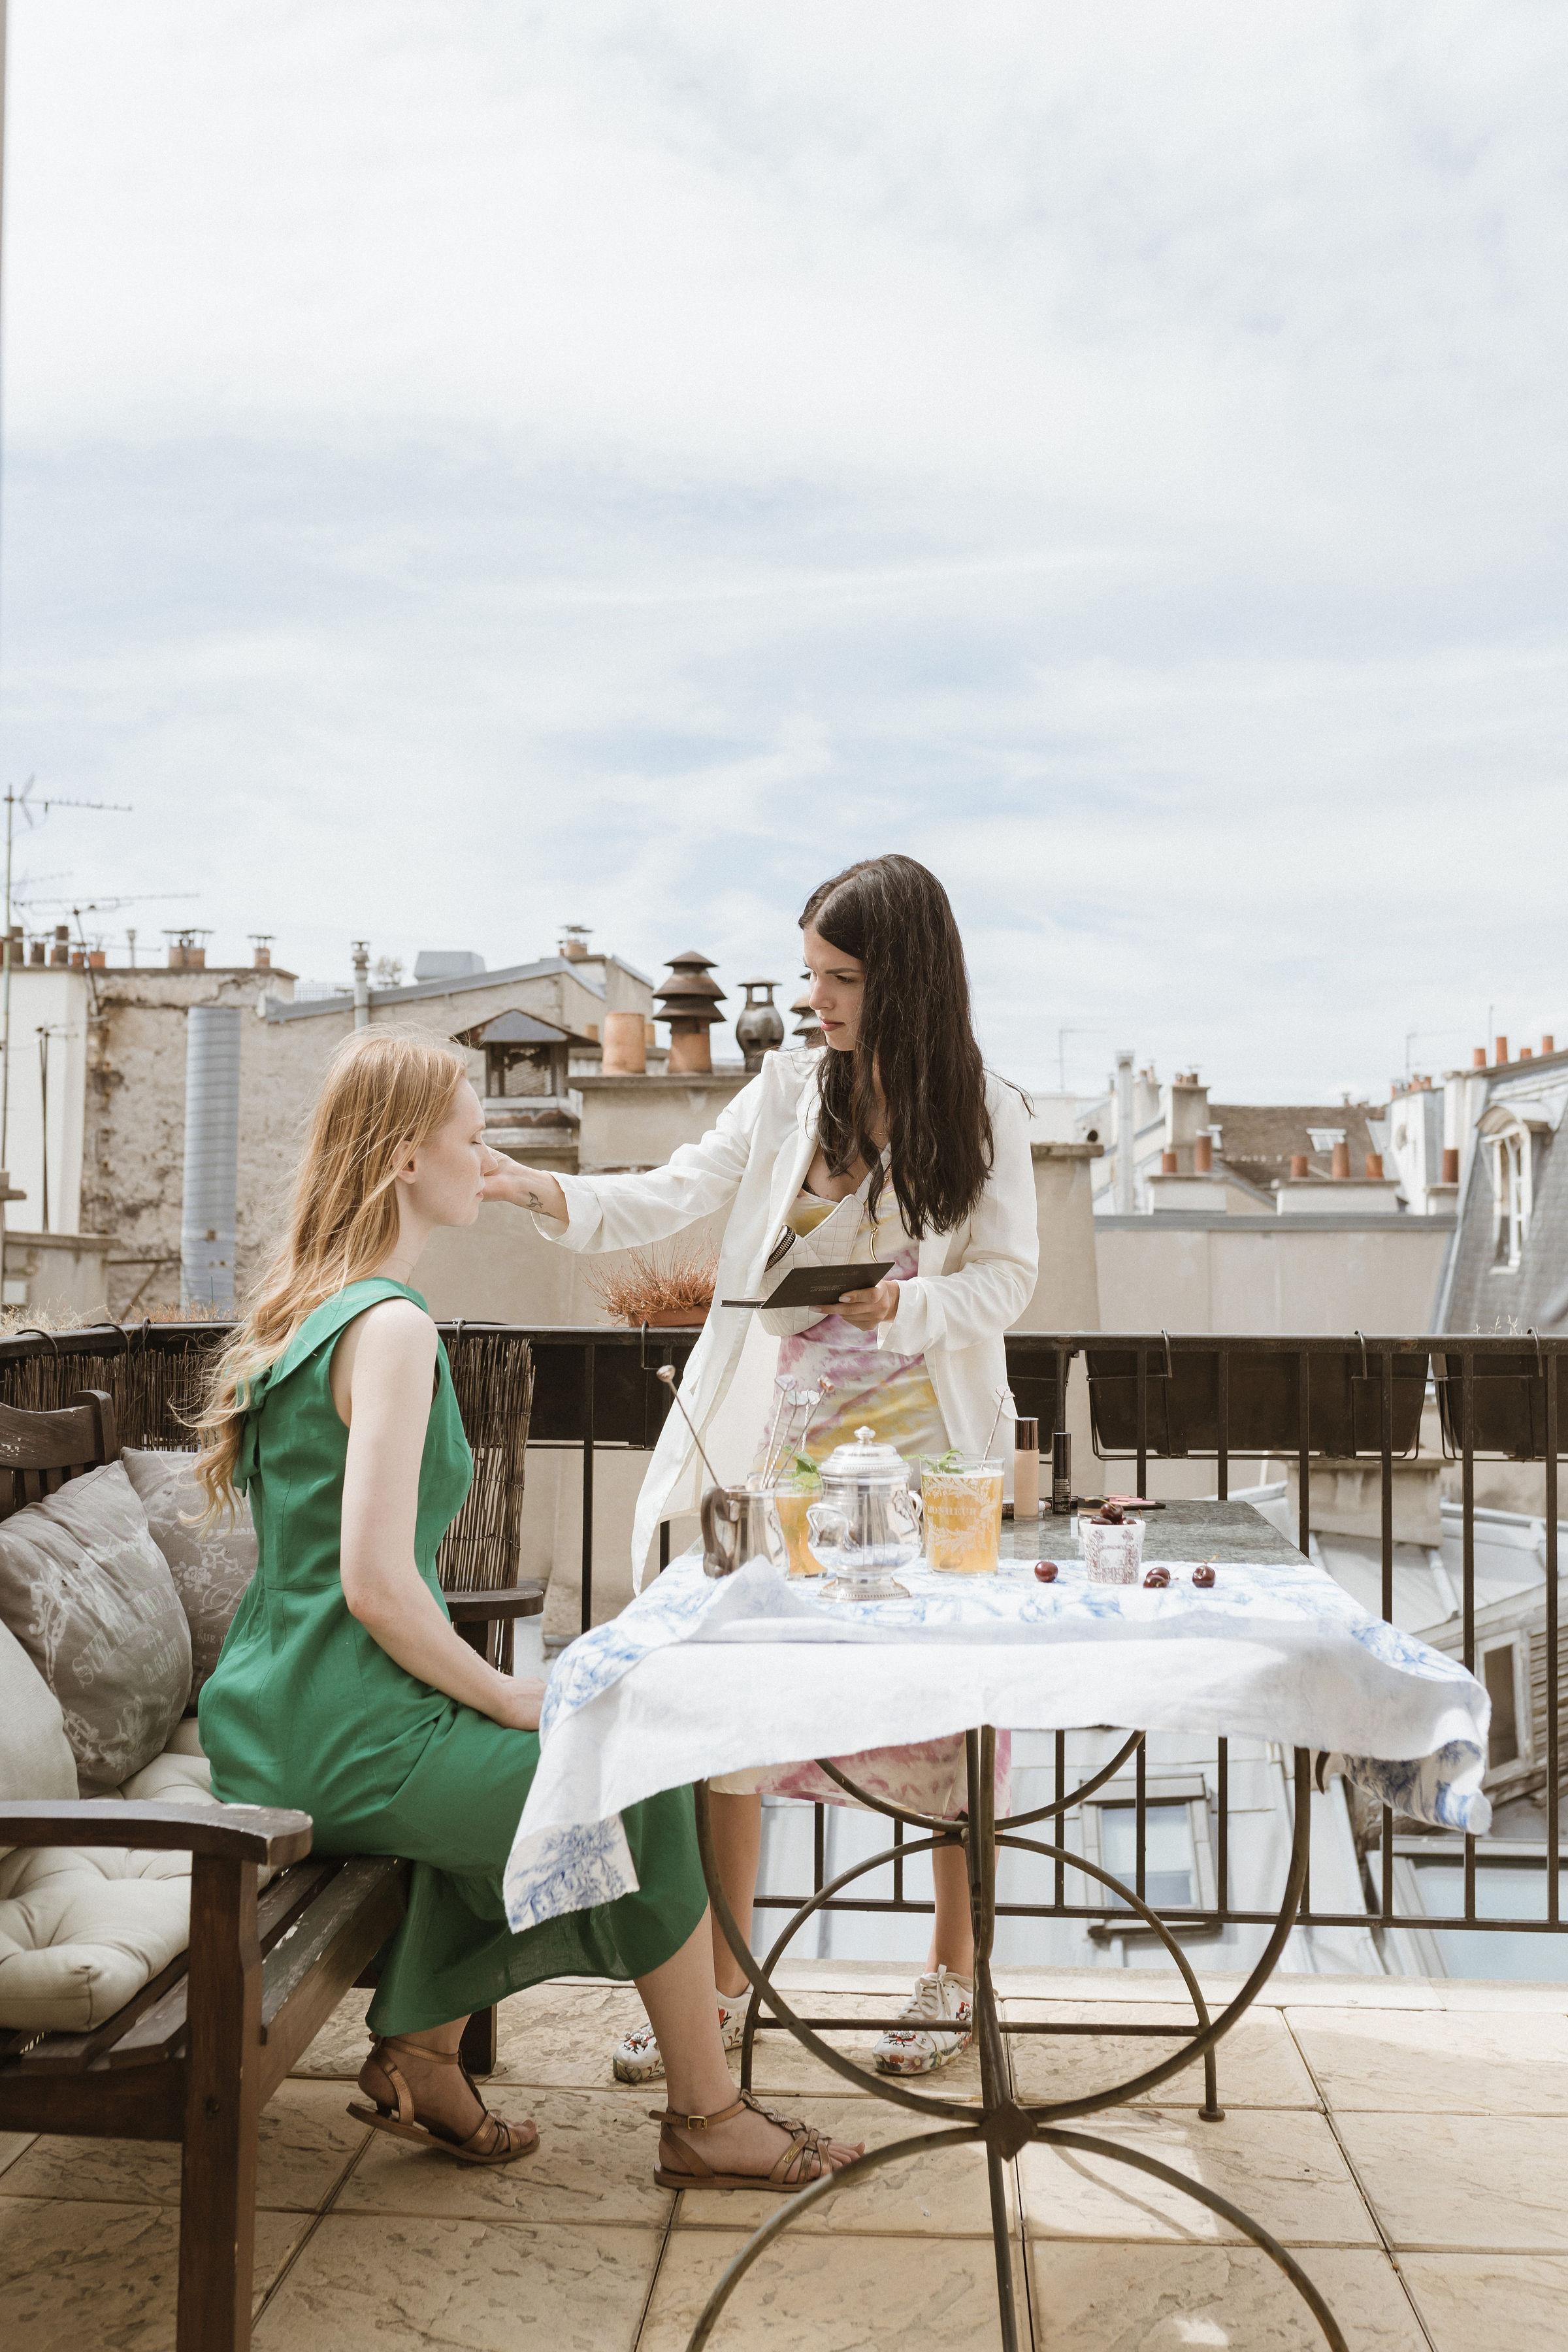 Sasha Lebeid Parisian Makeup Artist by Paris Photographer iheartparisfr.jpg